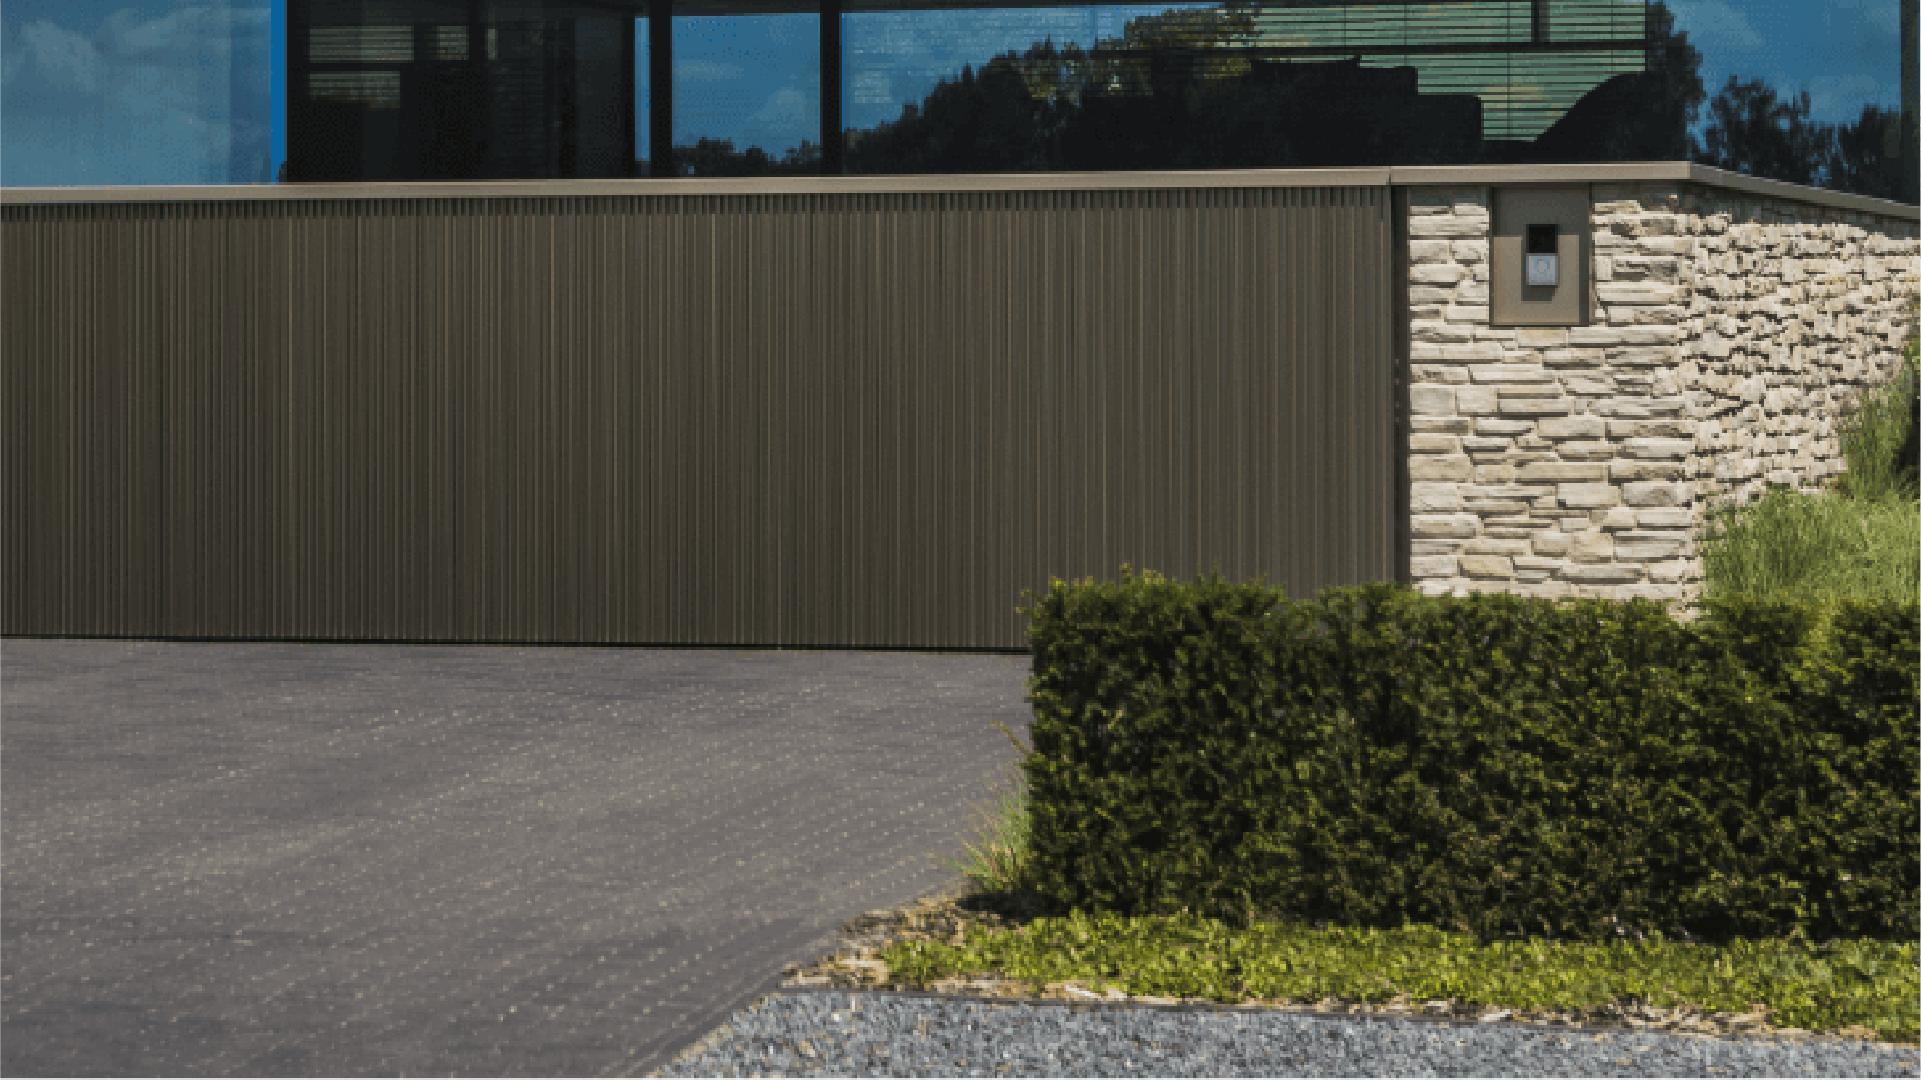 Alu Wall Hekwerk Afsluiting Aluminium Linarte